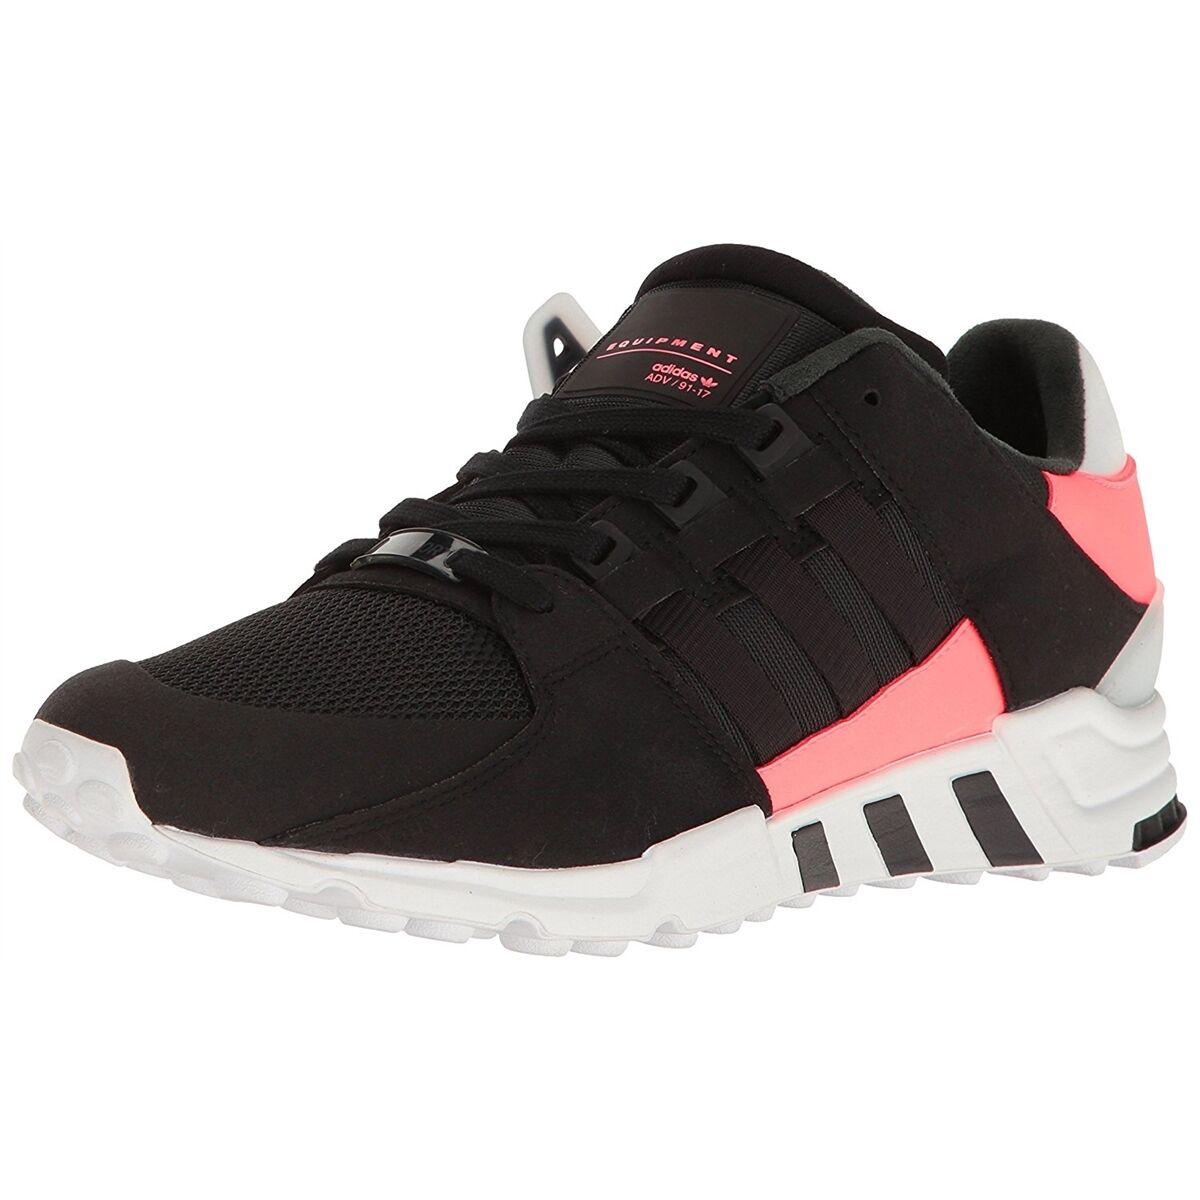 Adidas Originals EQT Support RF Black Retro Sneakers NEW Authentic Adidas BB1319